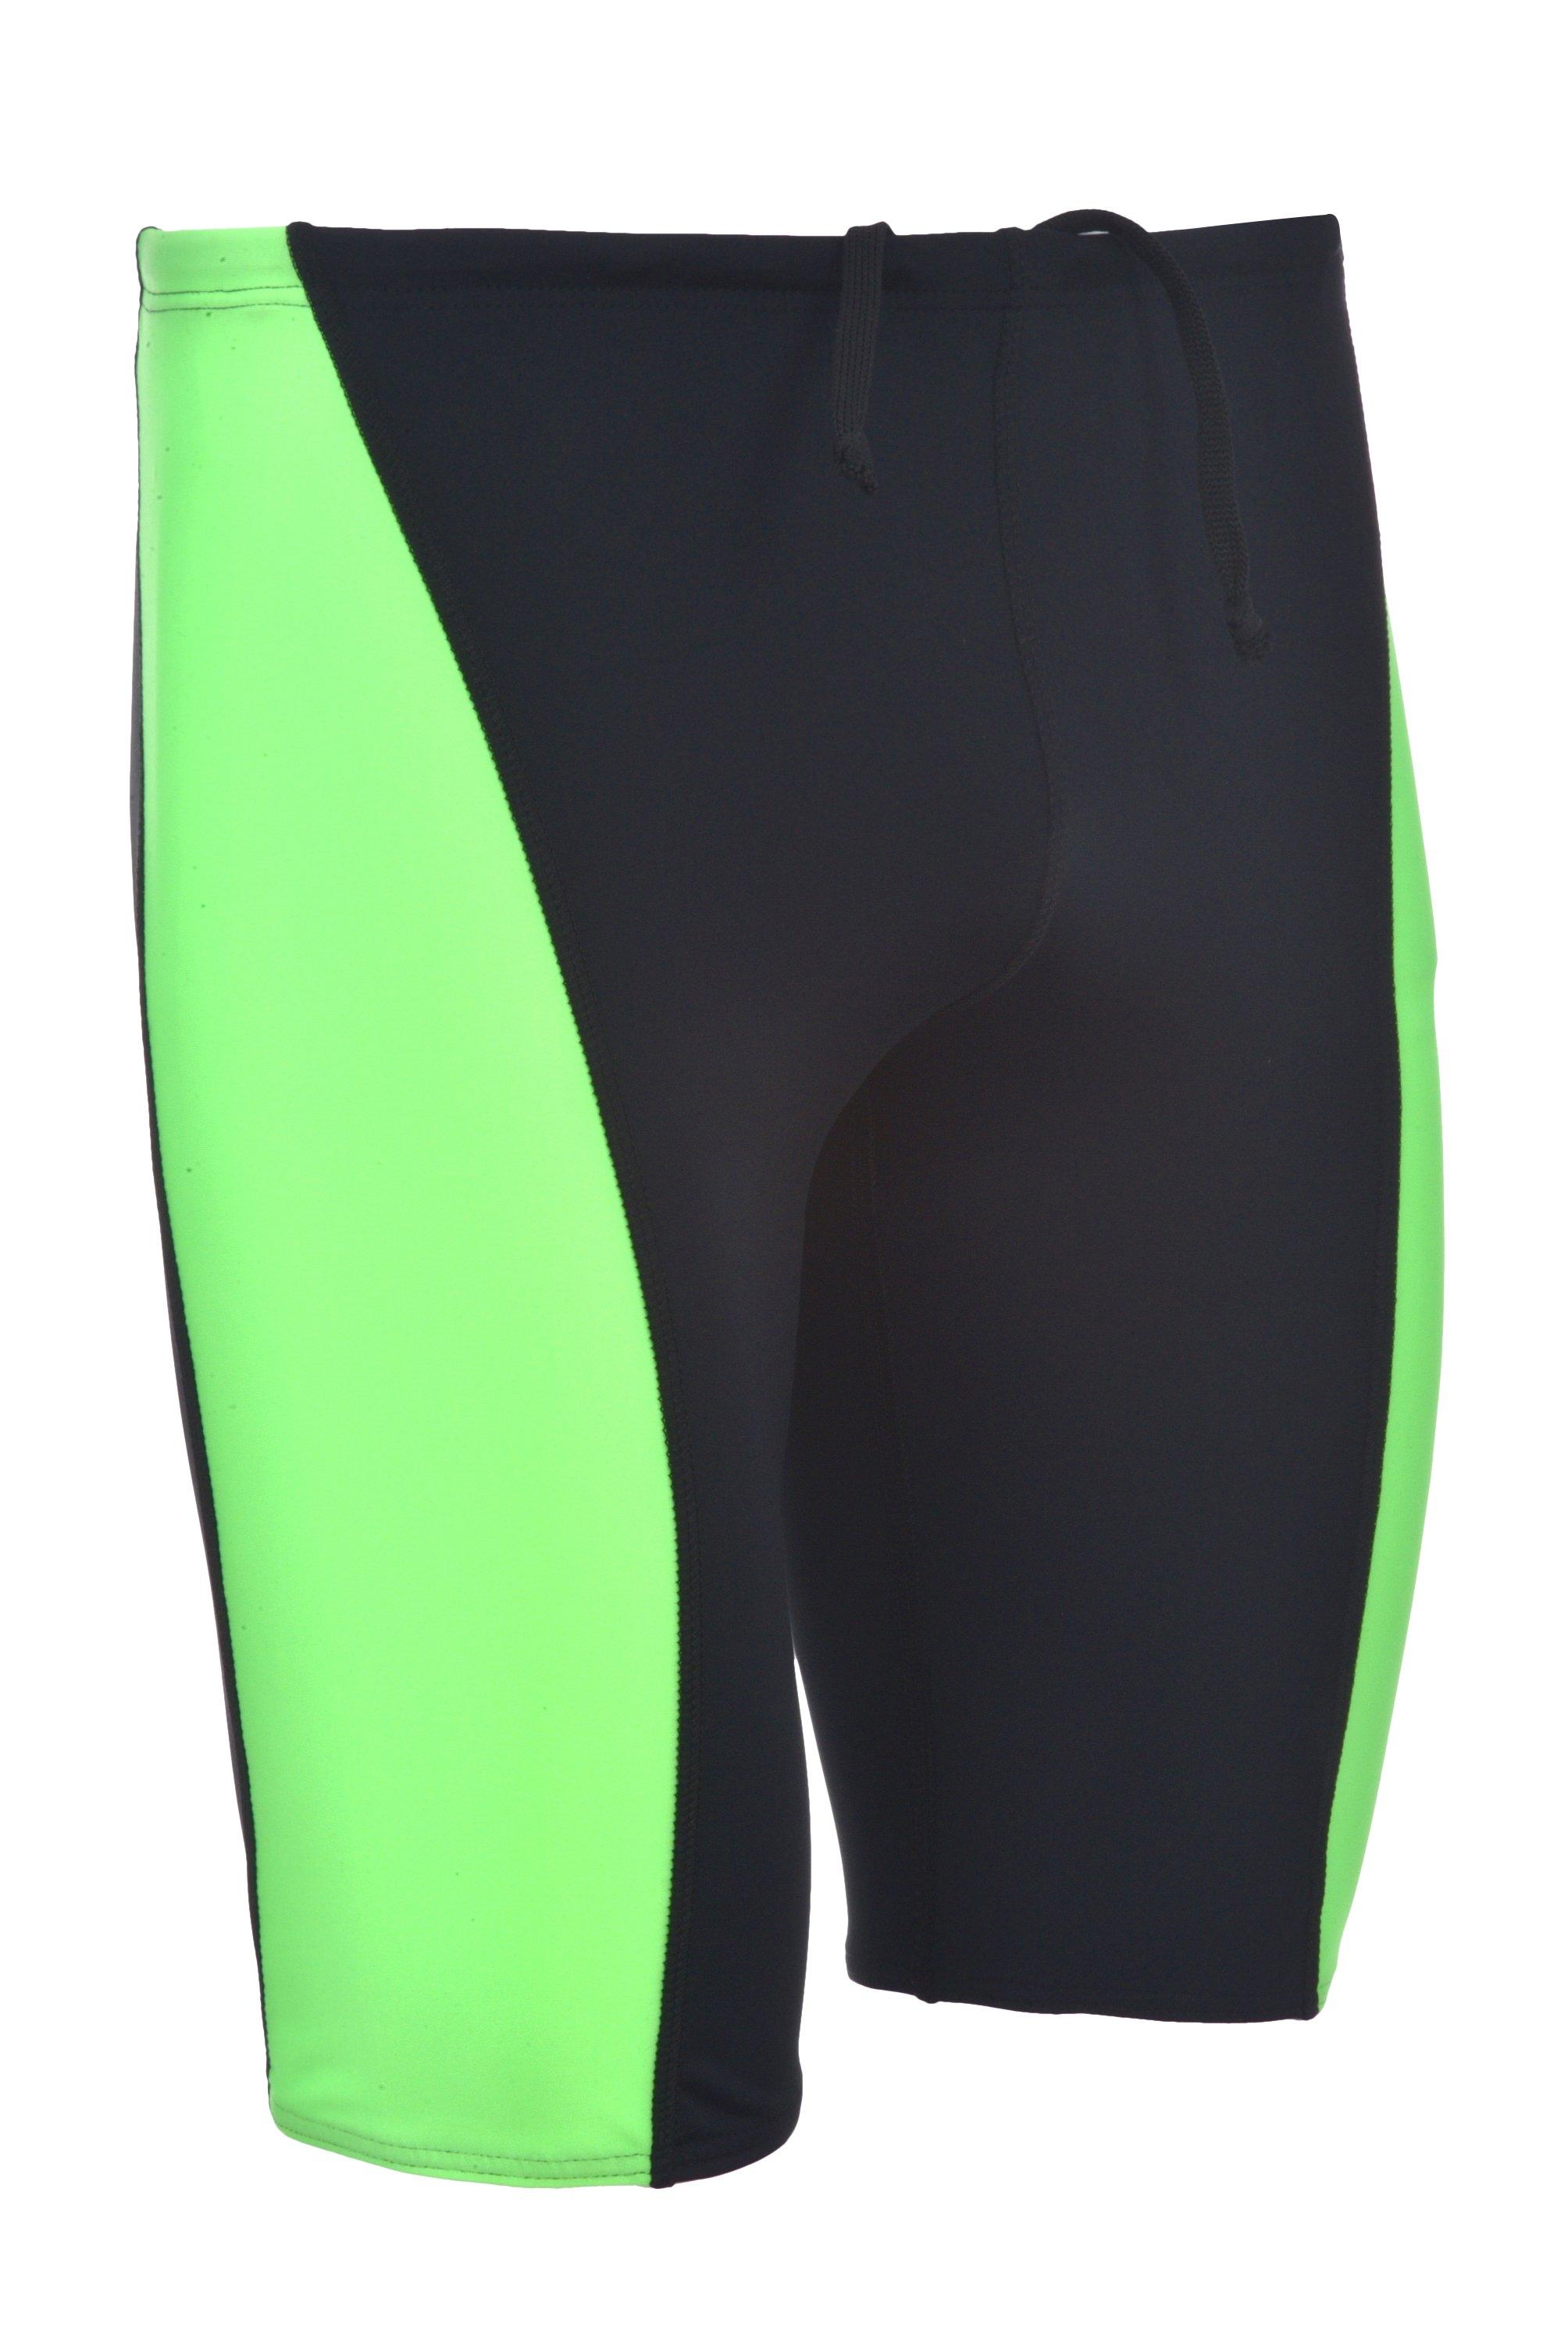 Men's Performance Swimsuit Racer Jammer - Durable Spandex Nylon Blend Comfortable Swimwear Training Many Colors